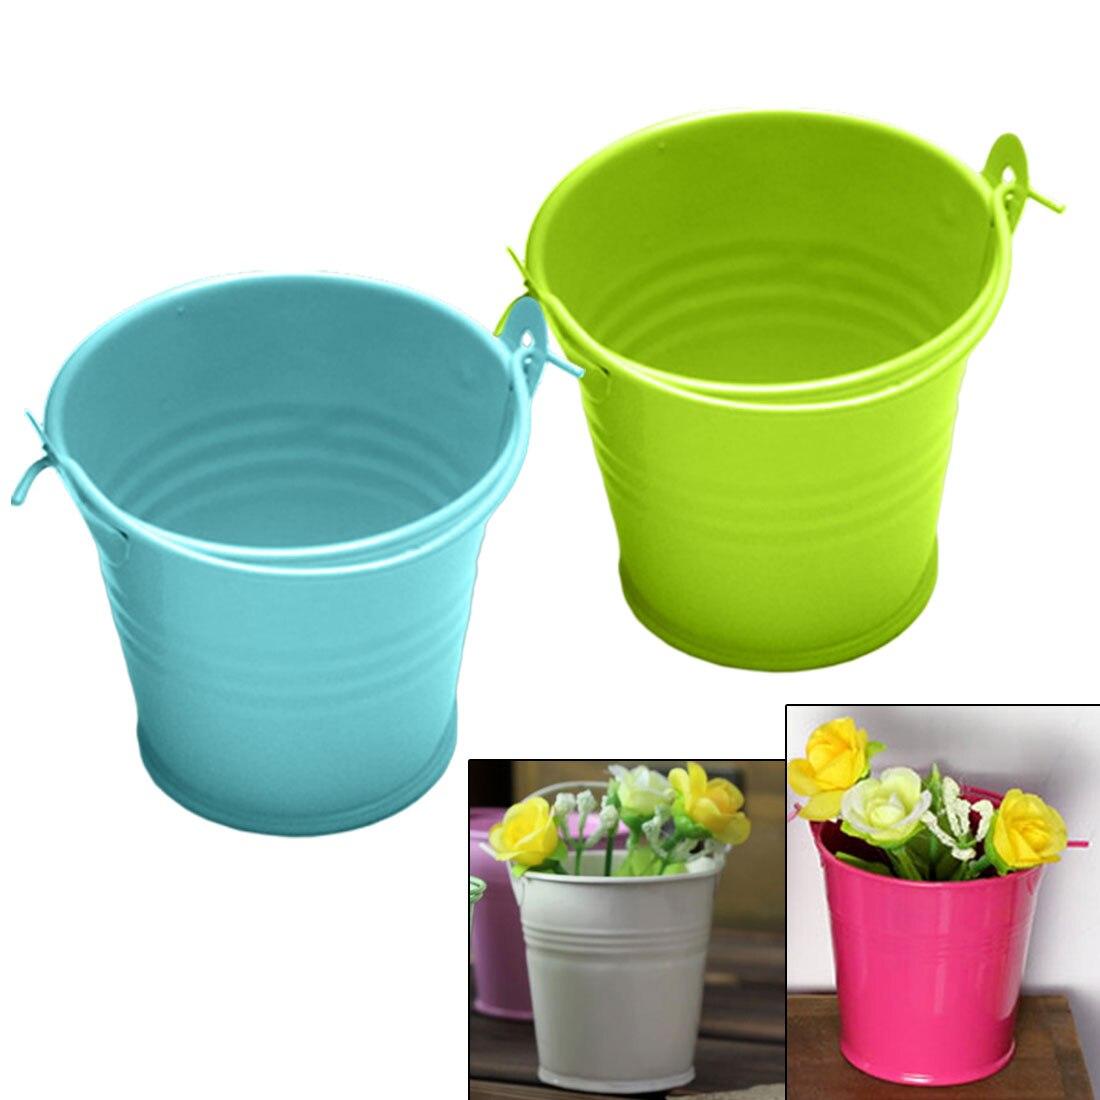 Garden Balcony Succulent Plant Flowerpot MIni Metal Hanging Pots  Home Office Decor Iron Bucket With Handle